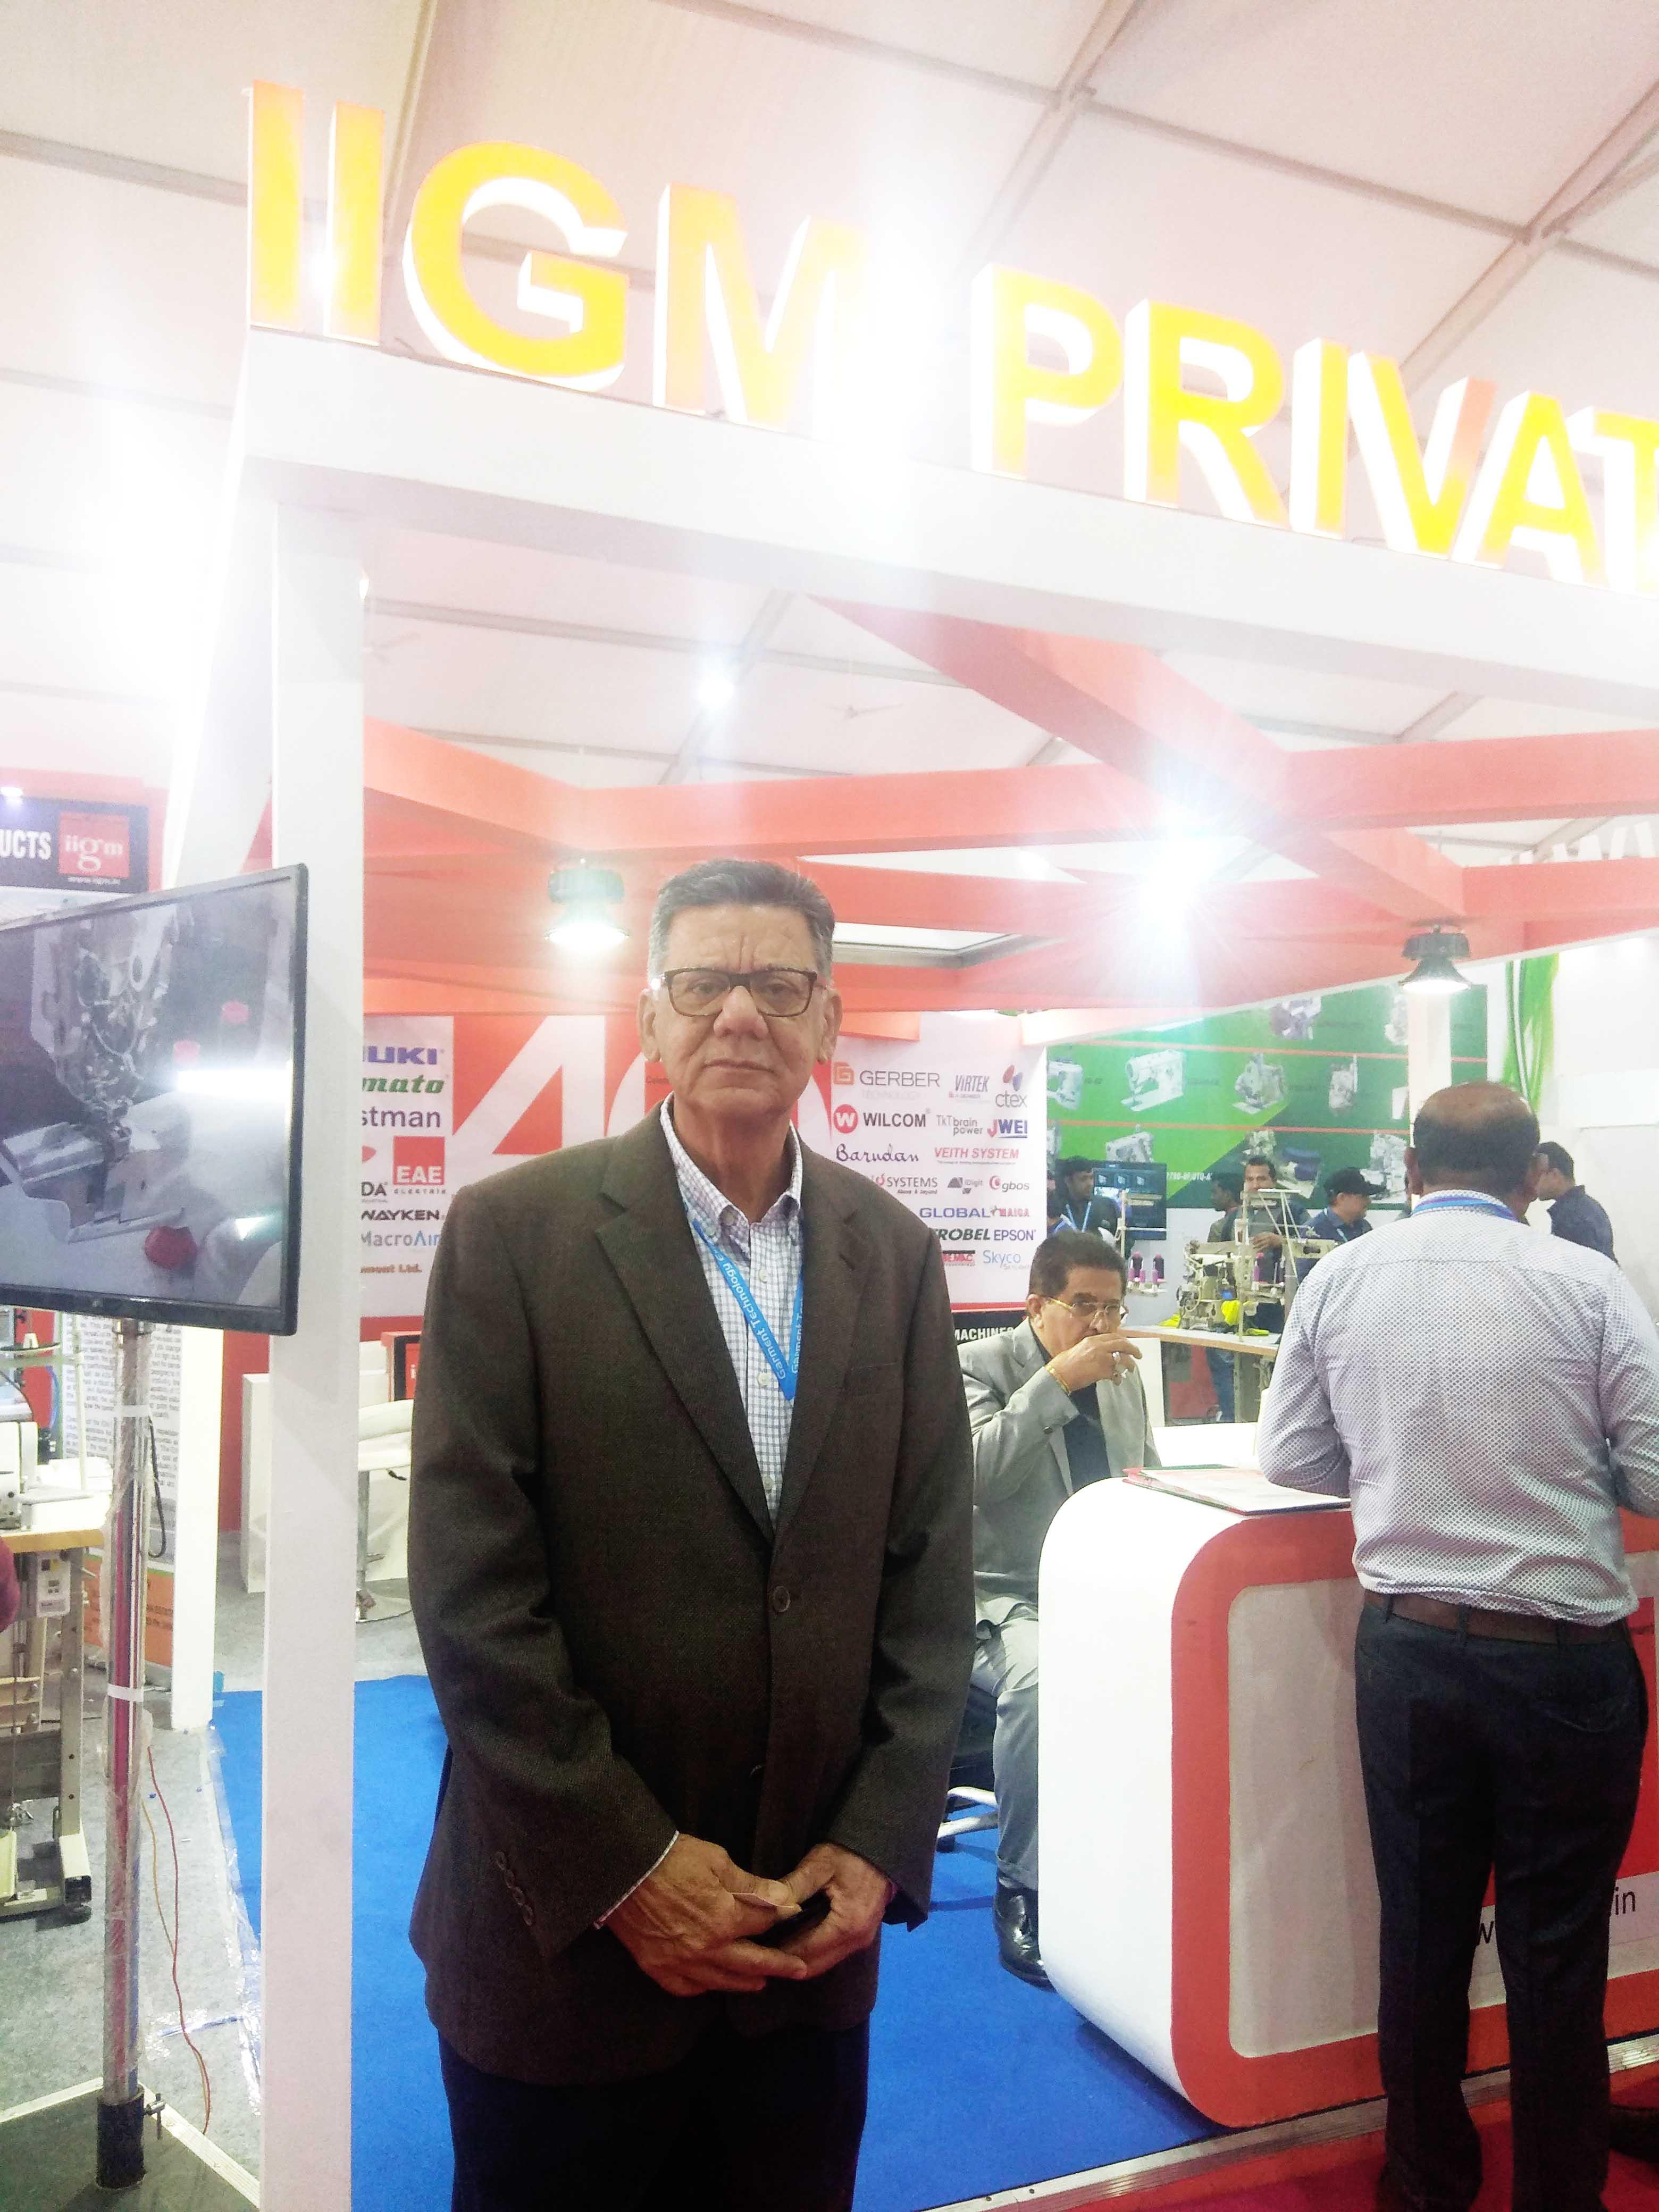 PavanKapoor, Managing Director, IIGM Private Limited